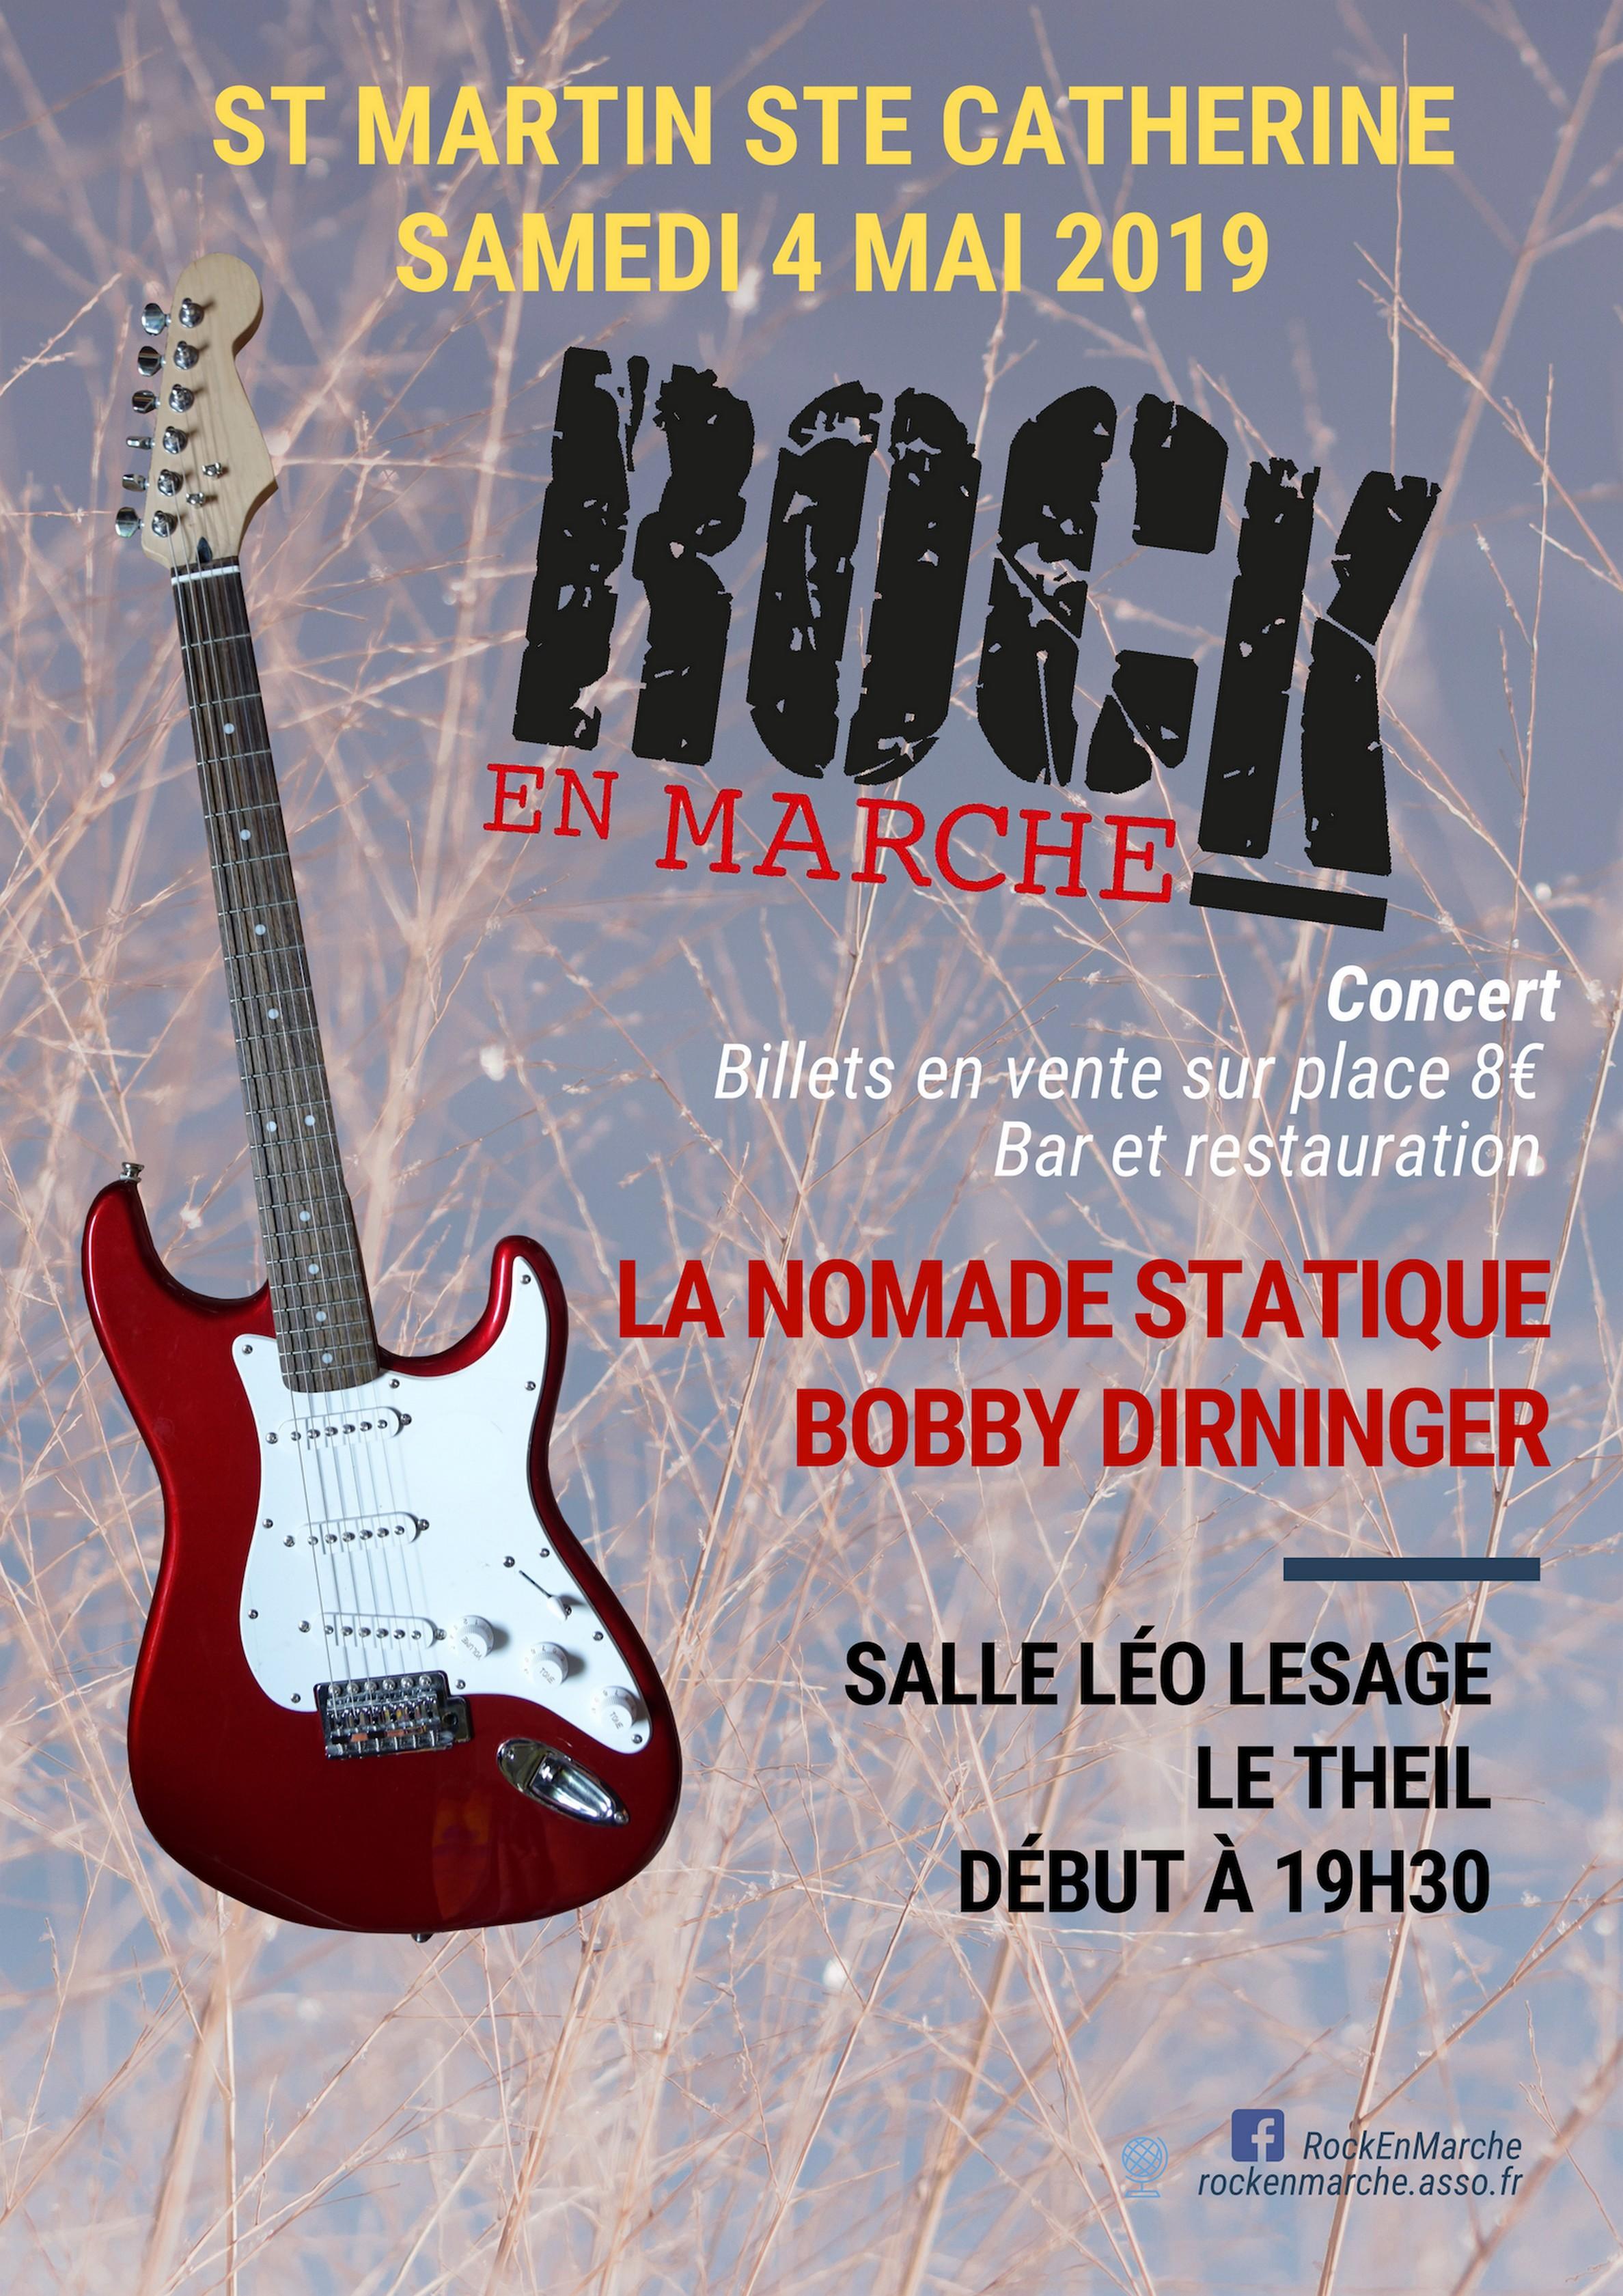 Affiche concert 4 mai 2019 v2